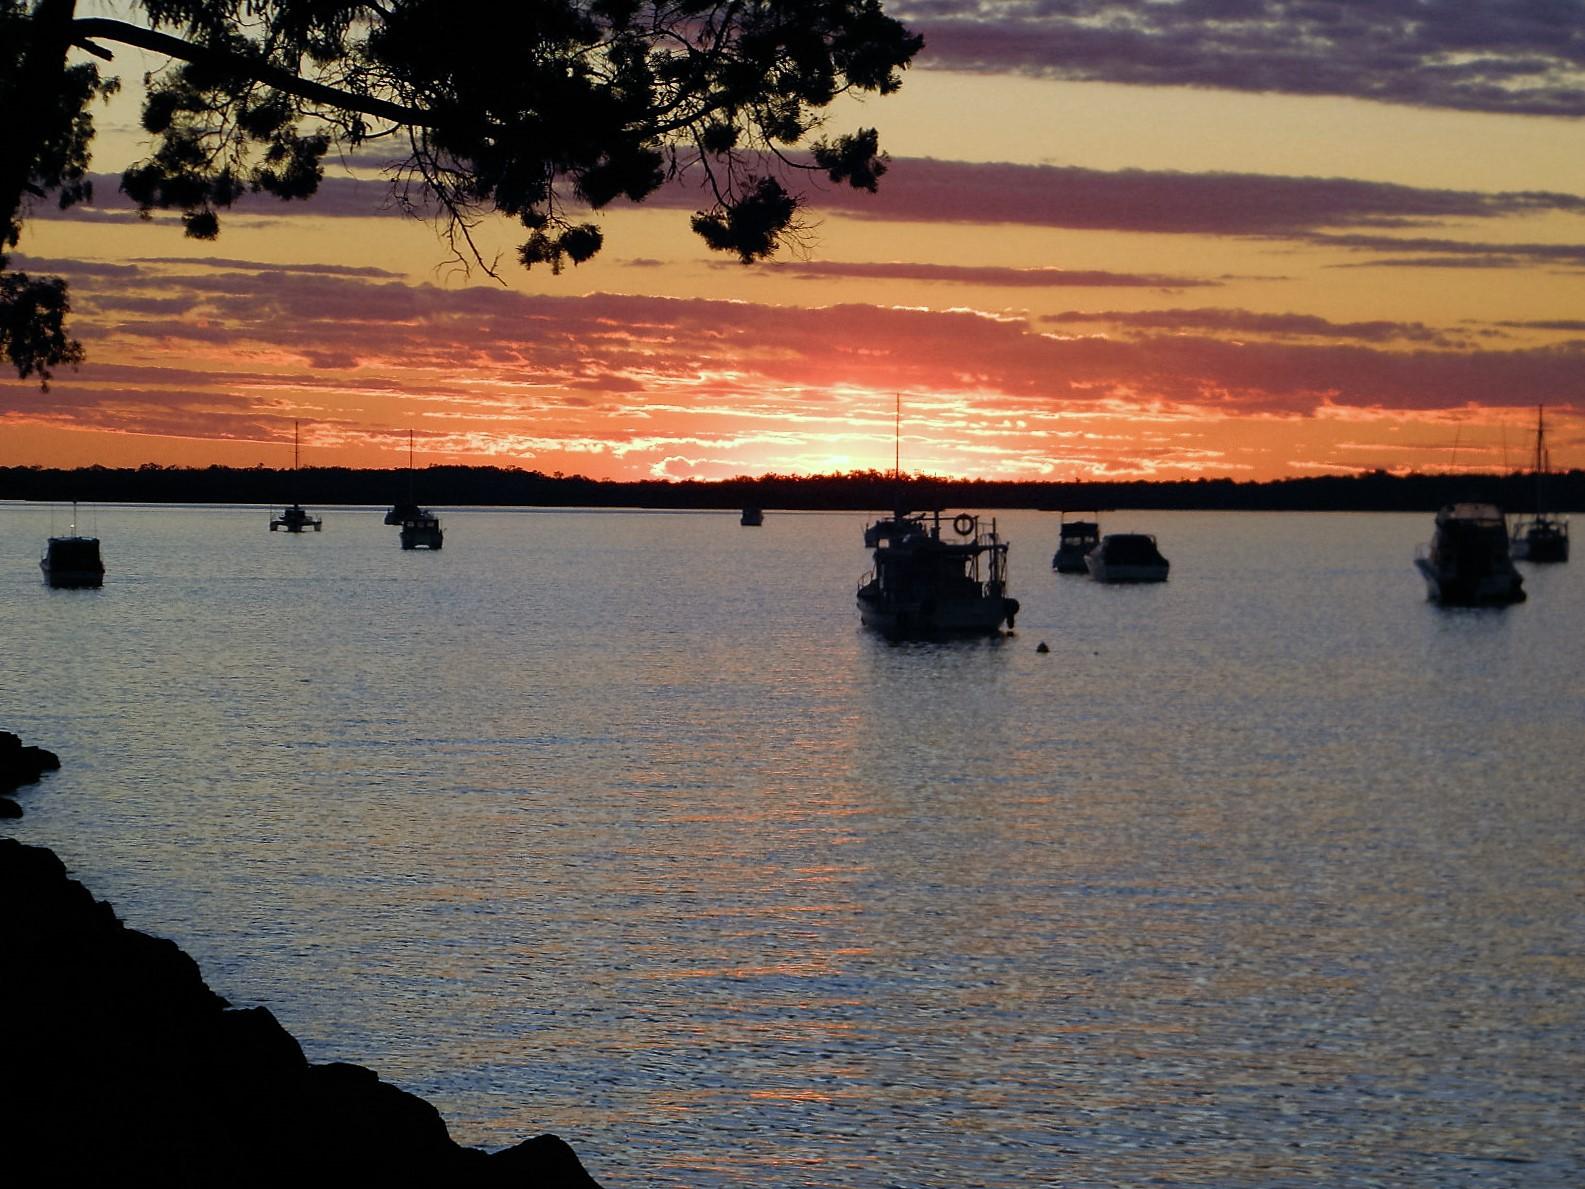 Sunset on Burrum River